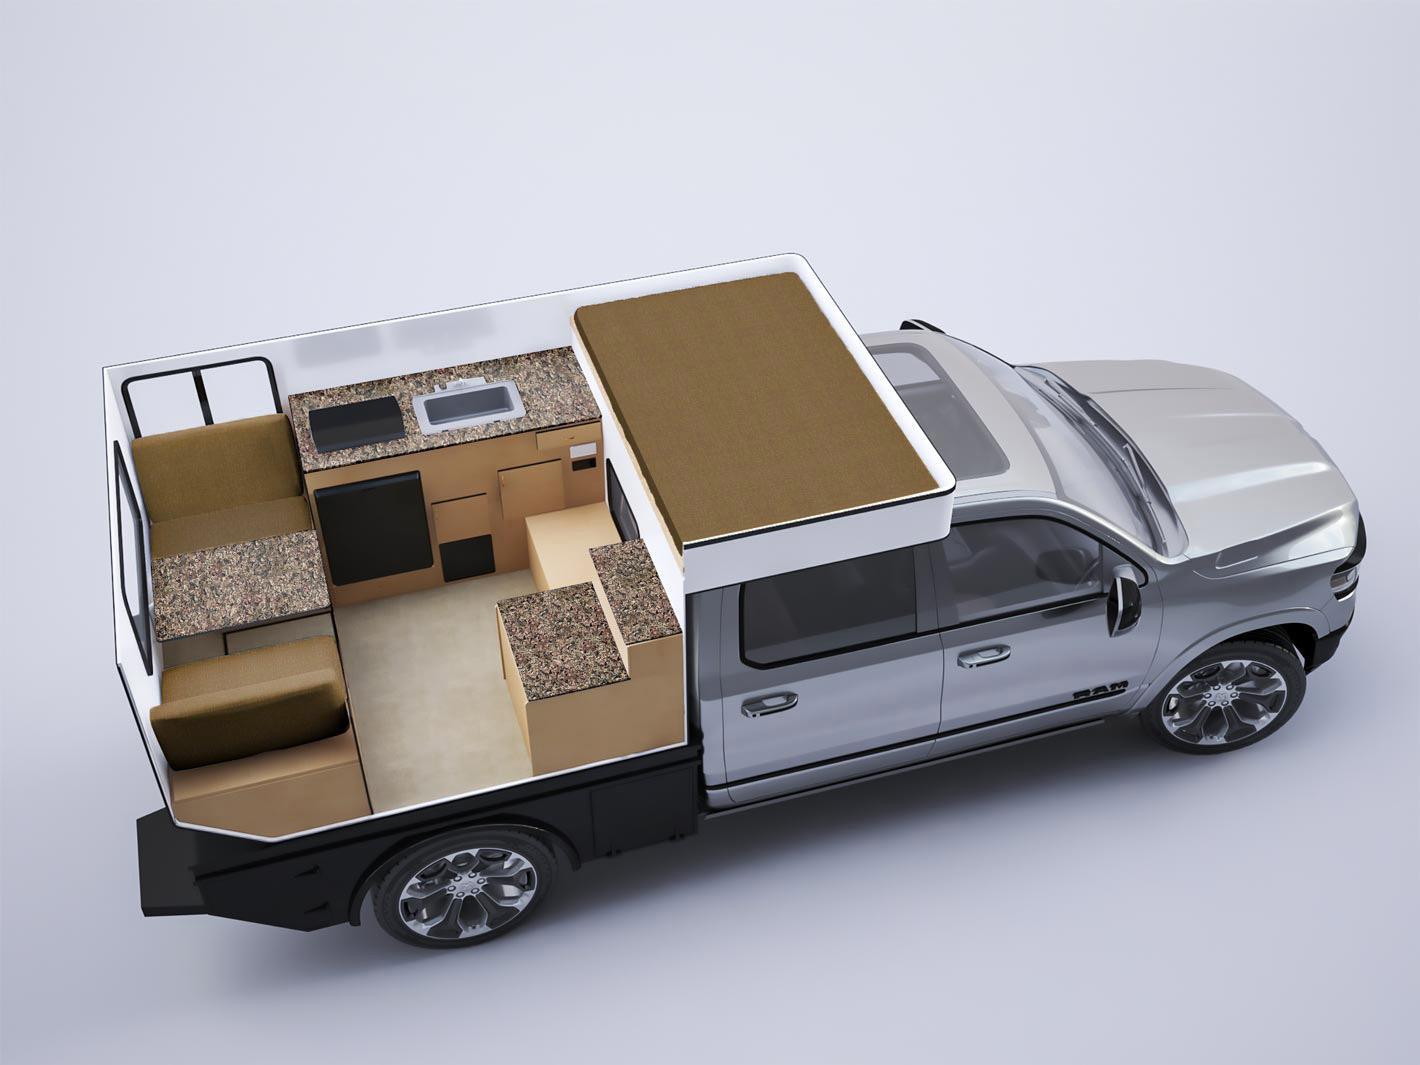 Fleet Flat Bed Model Four Wheel Campers